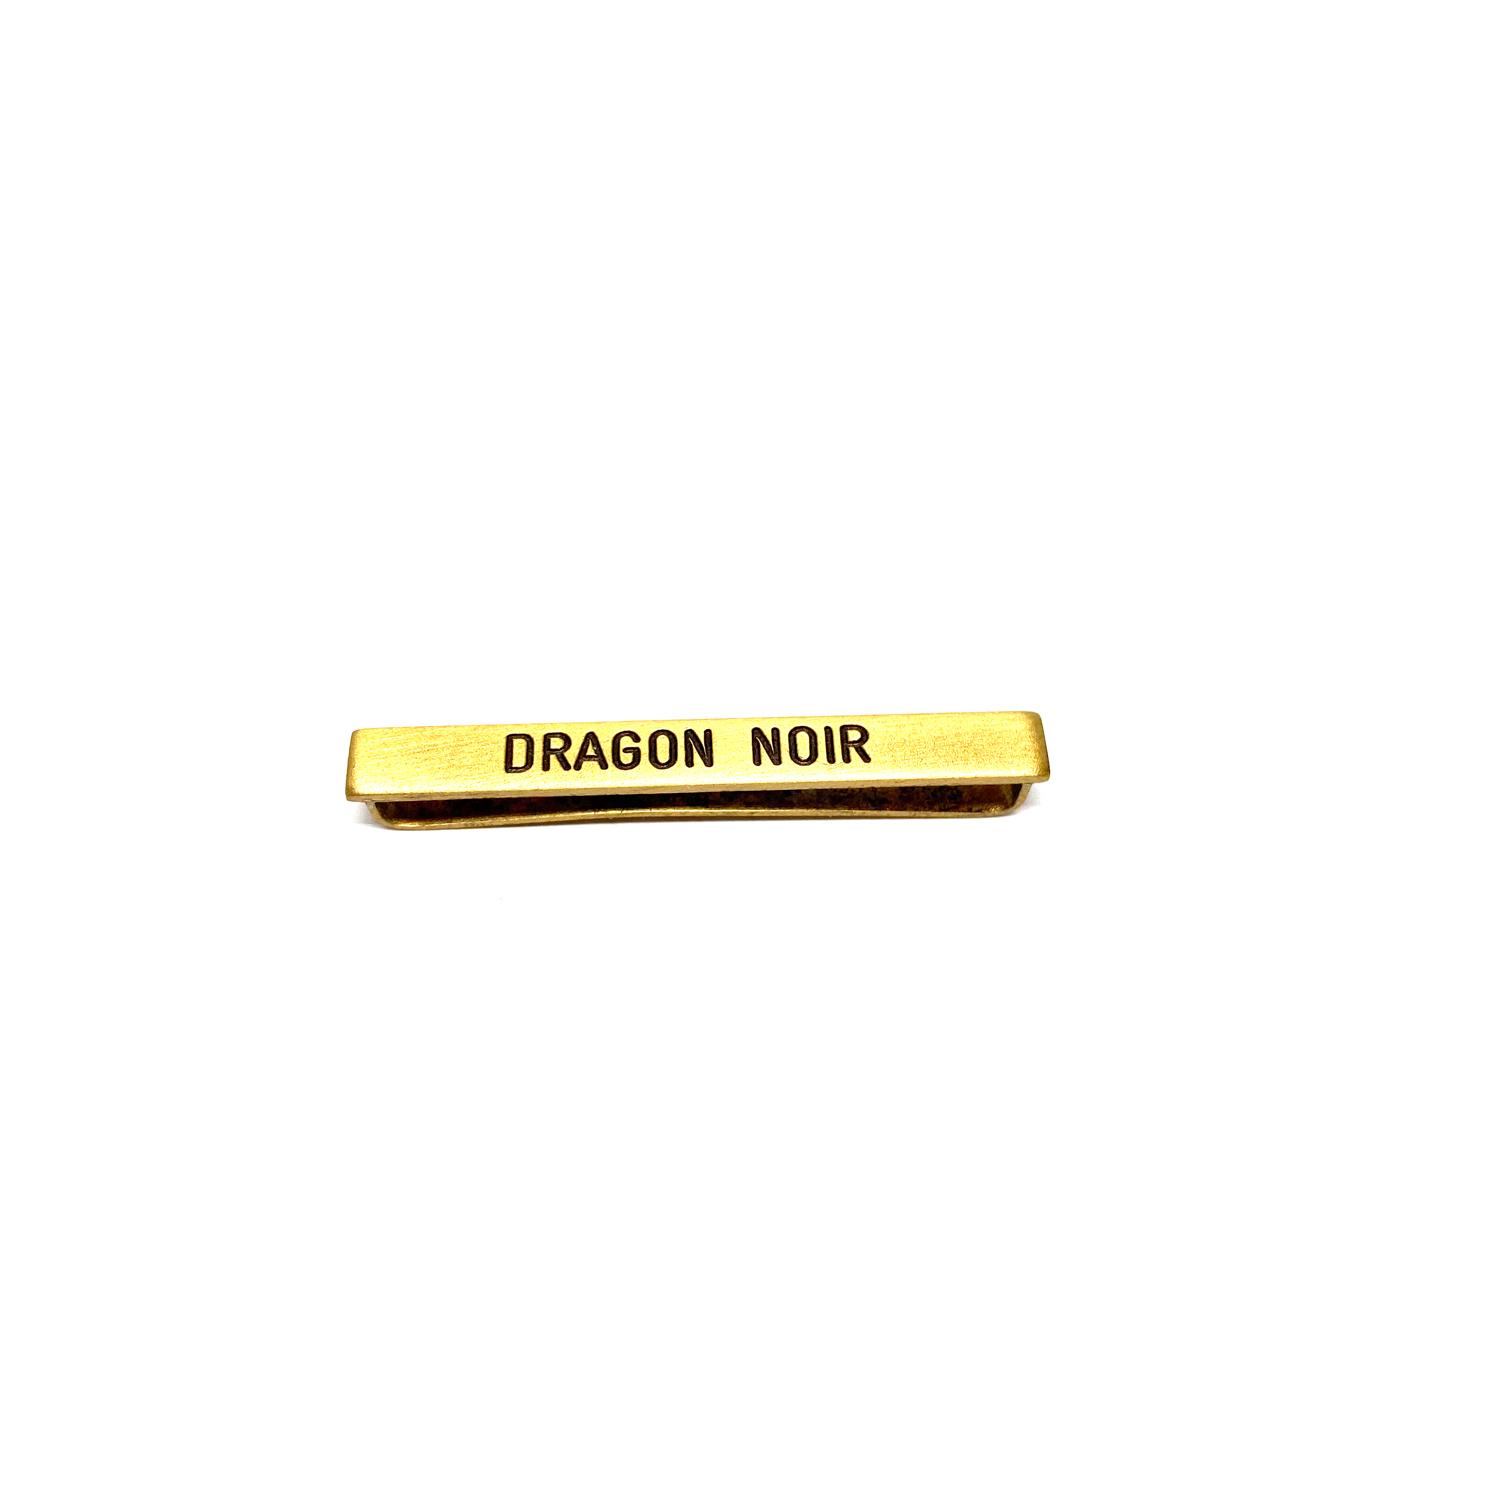 Bar Dragon Noir for military medals